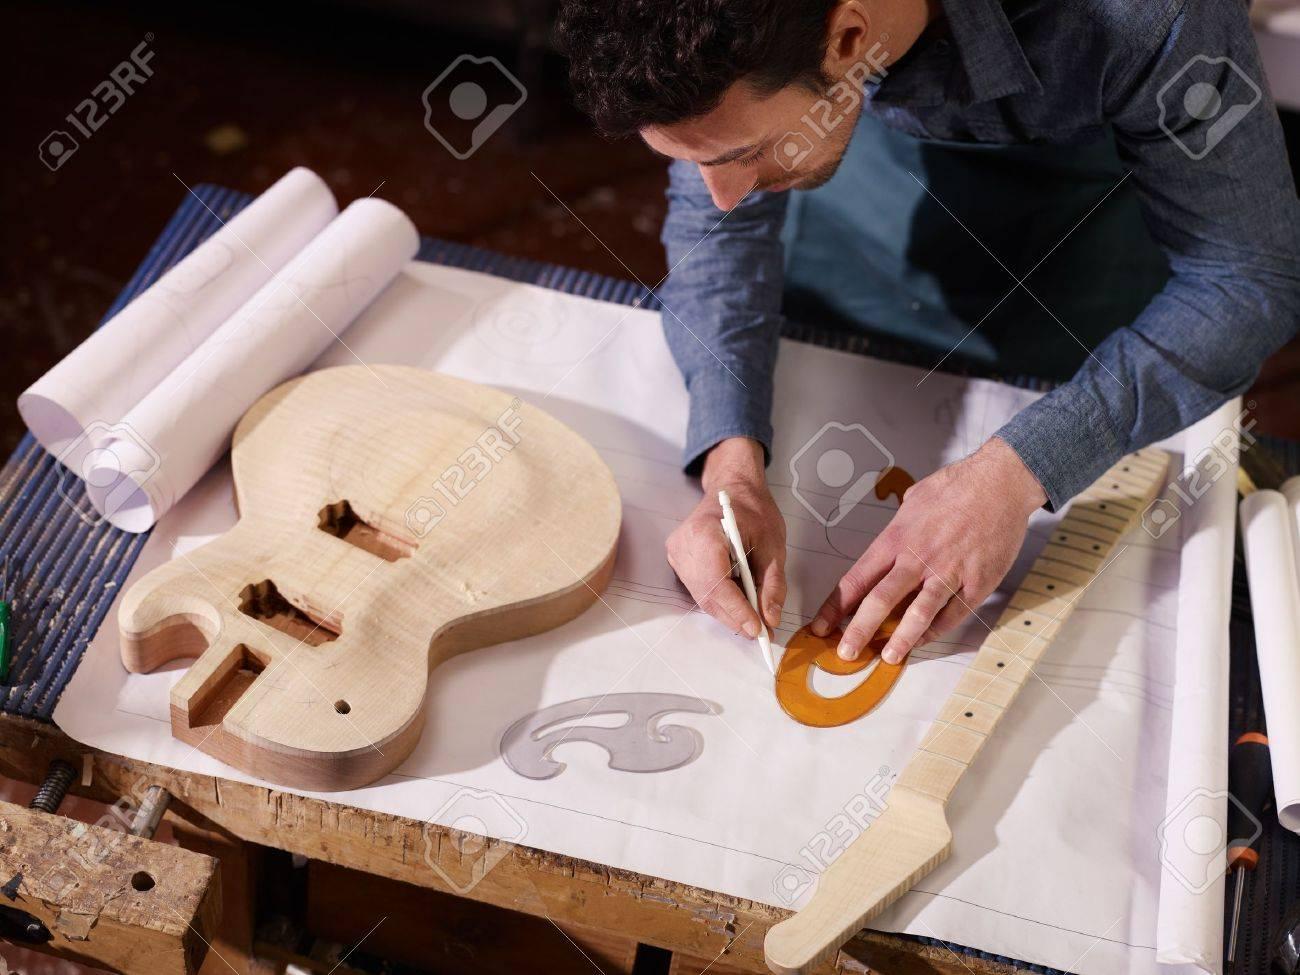 Mid adult man at work as craftsman in italian workshop with mid adult man at work as craftsman in italian workshop with guitars and blueprints drawing malvernweather Choice Image